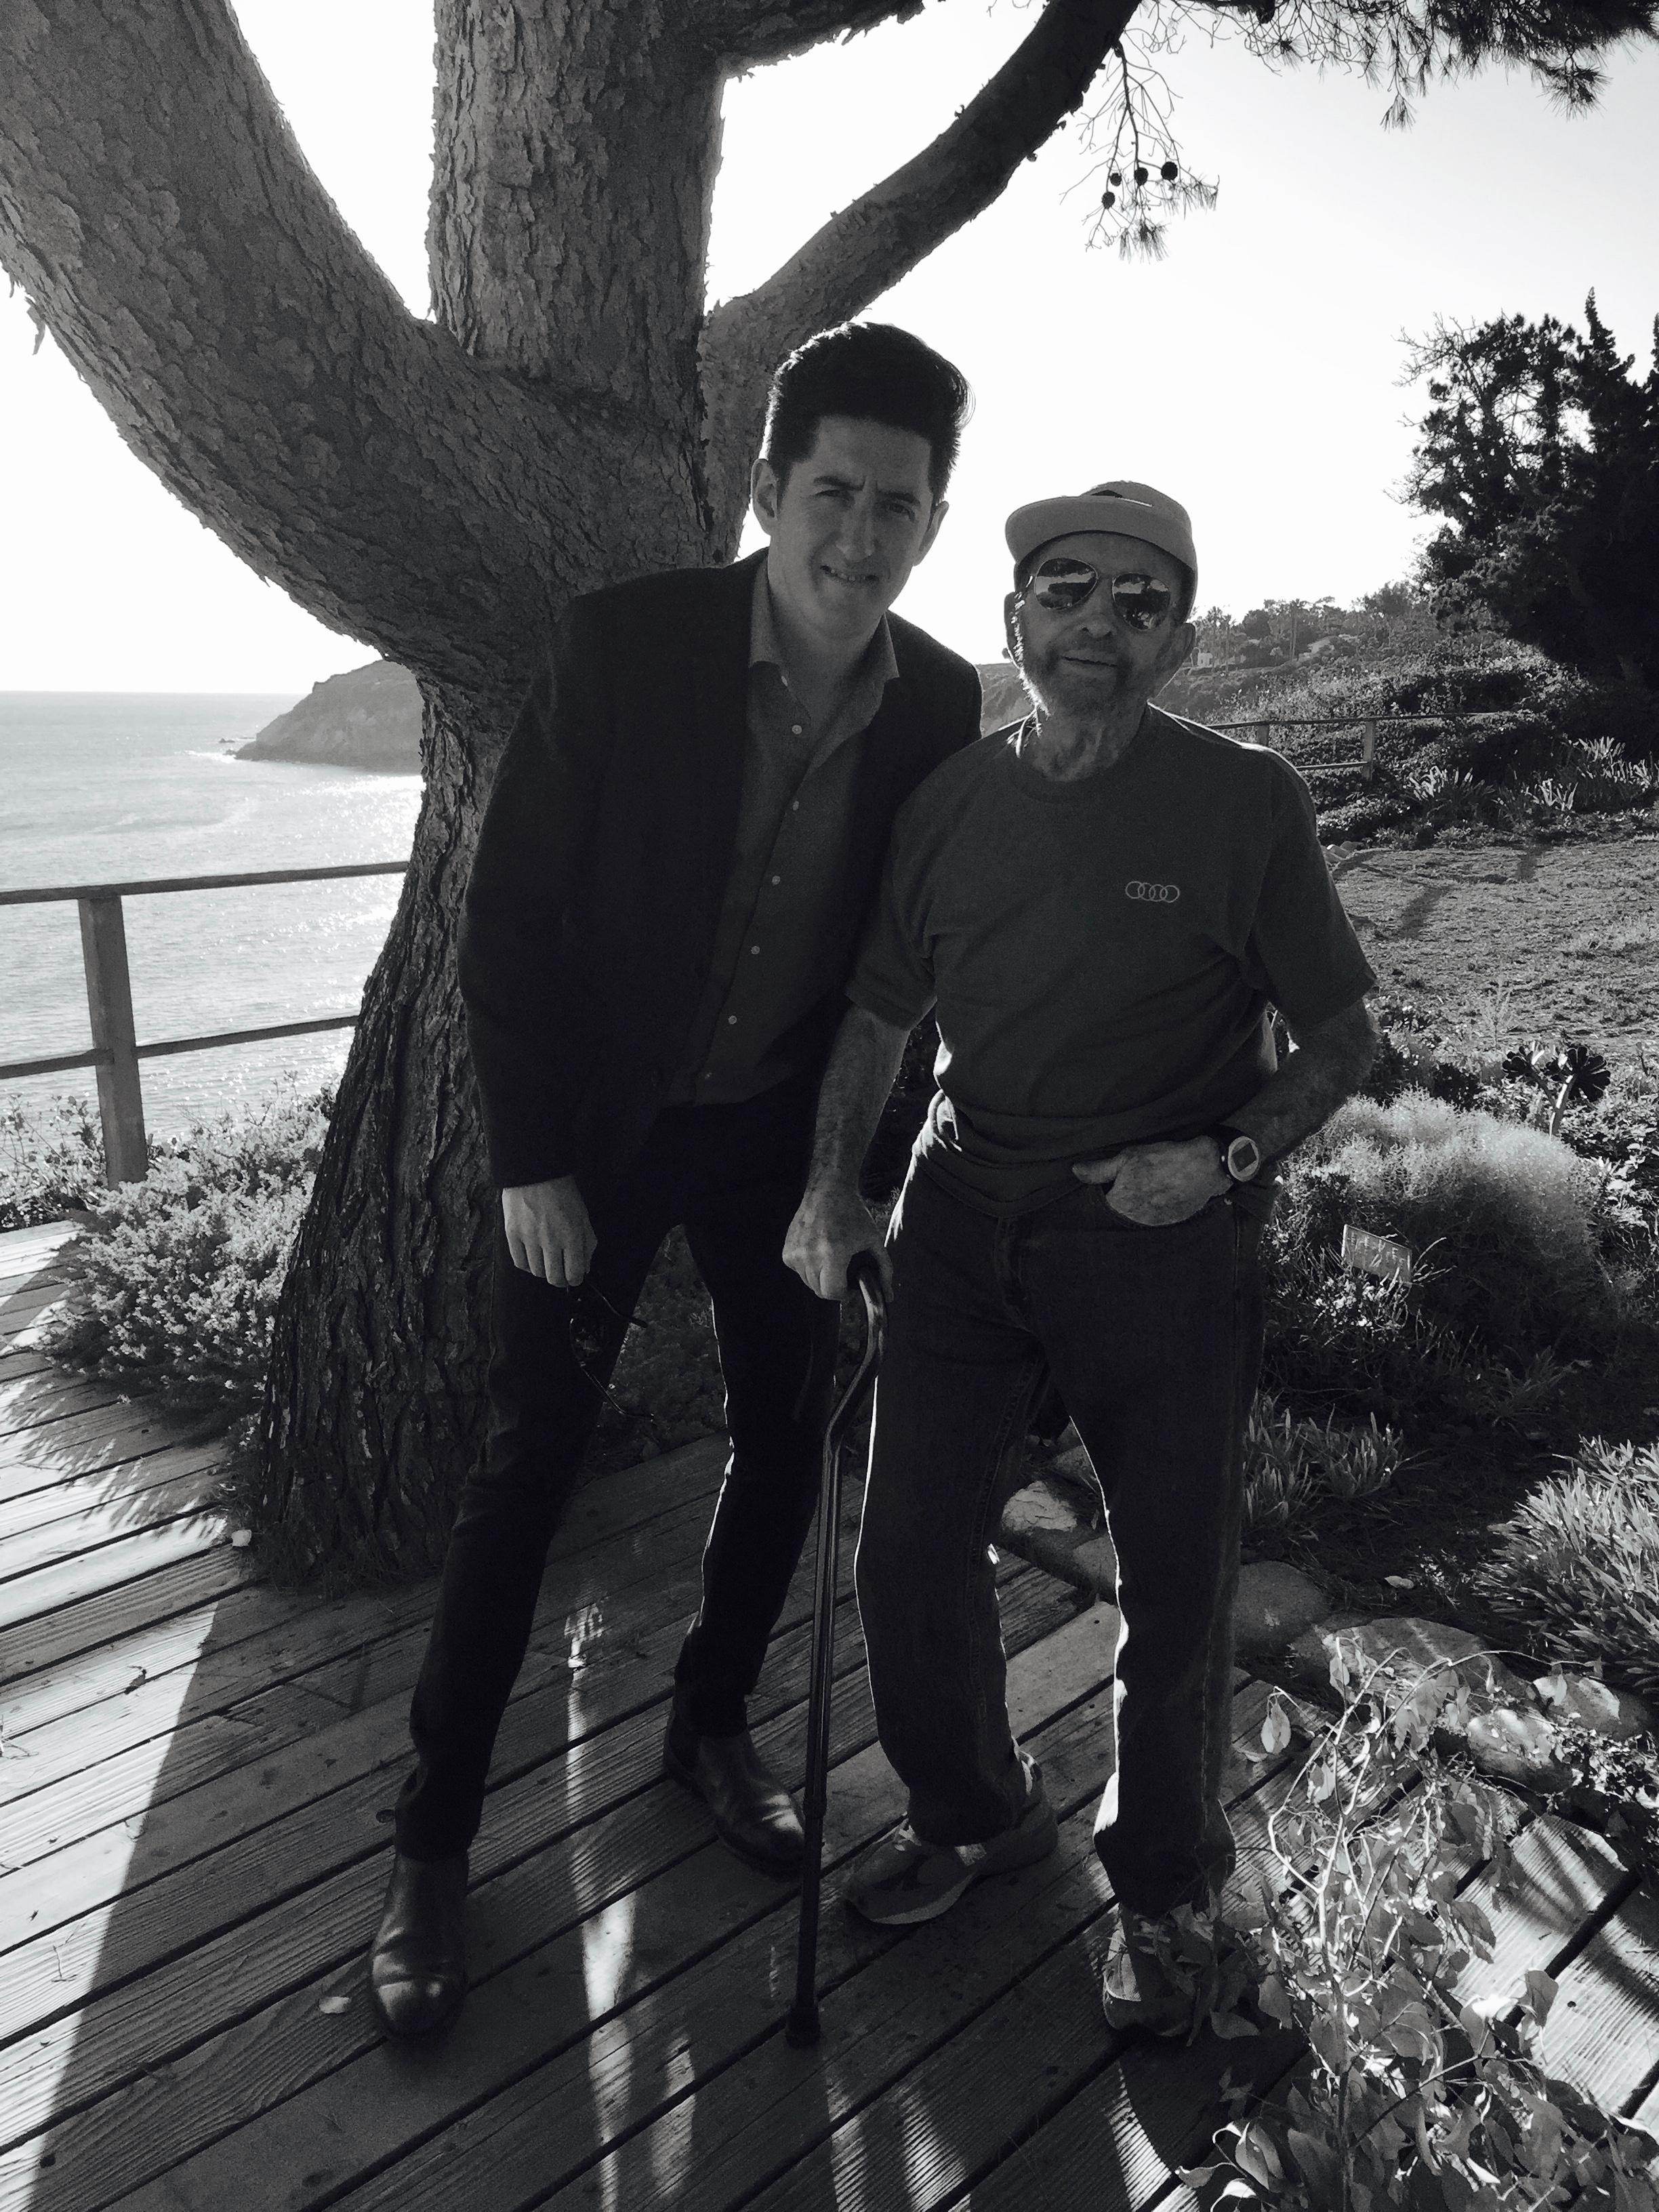 With the master,Johnny Mandel. Malibu CA, November 2015